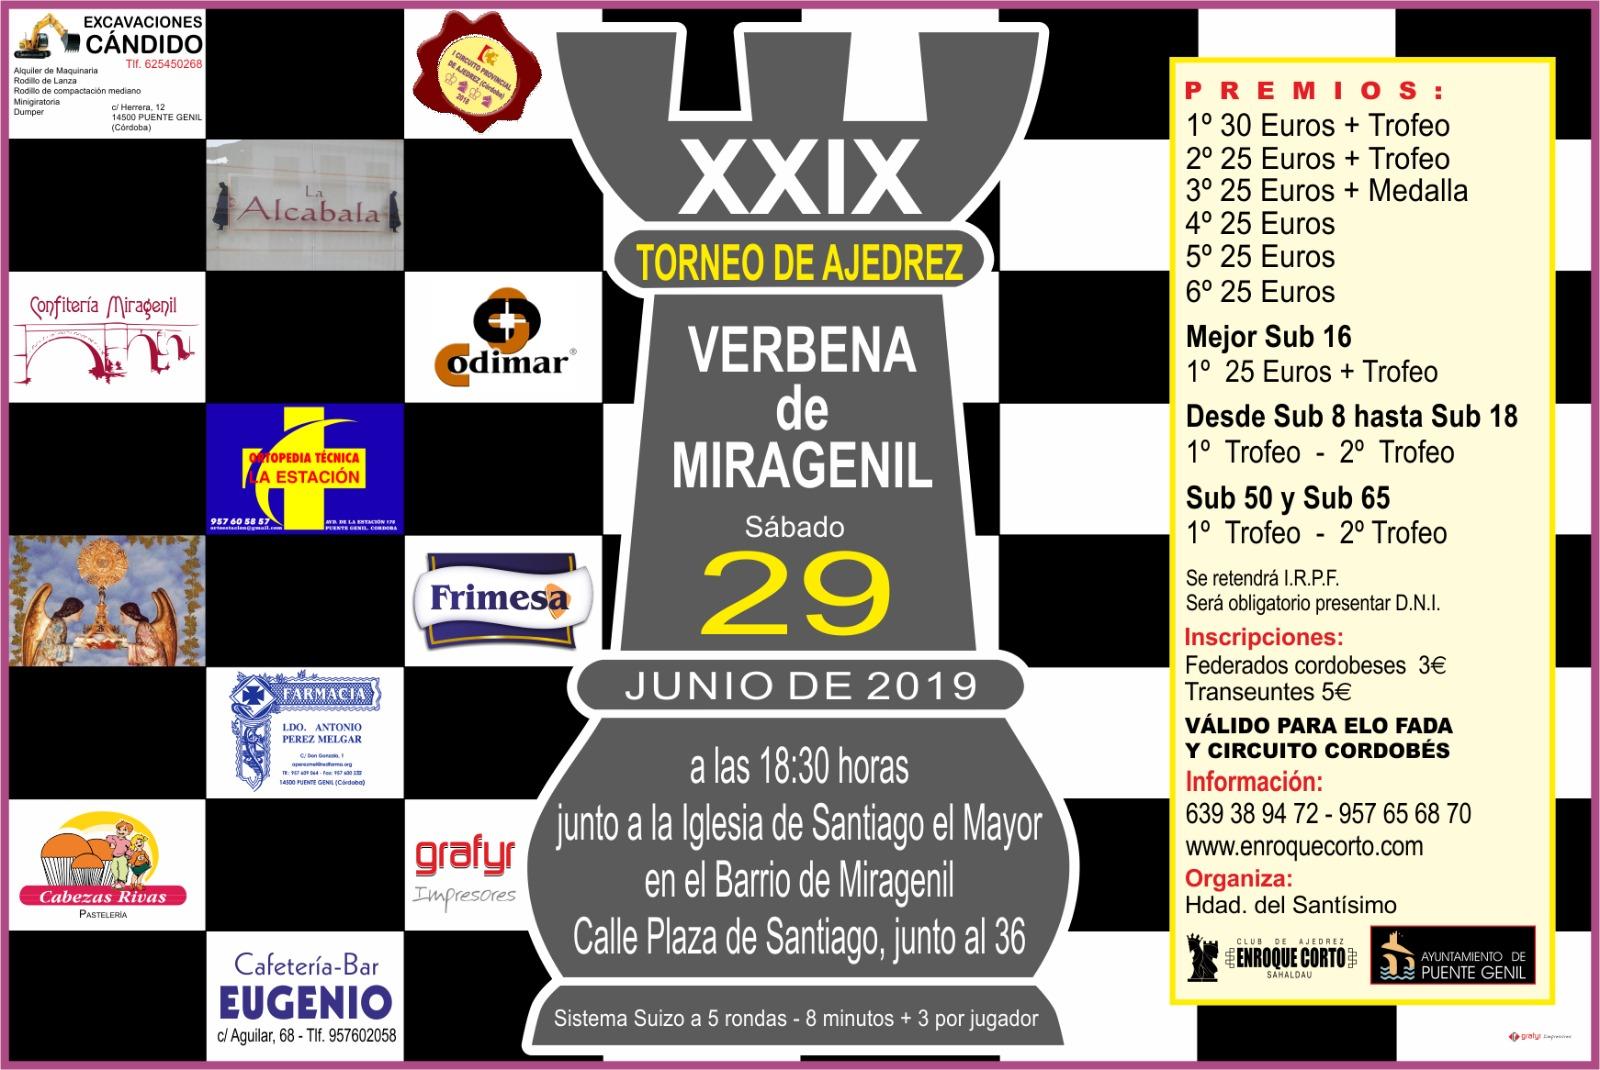 Torneo de Ajedrez Verbena de Miragenil de Puente Genil 2019